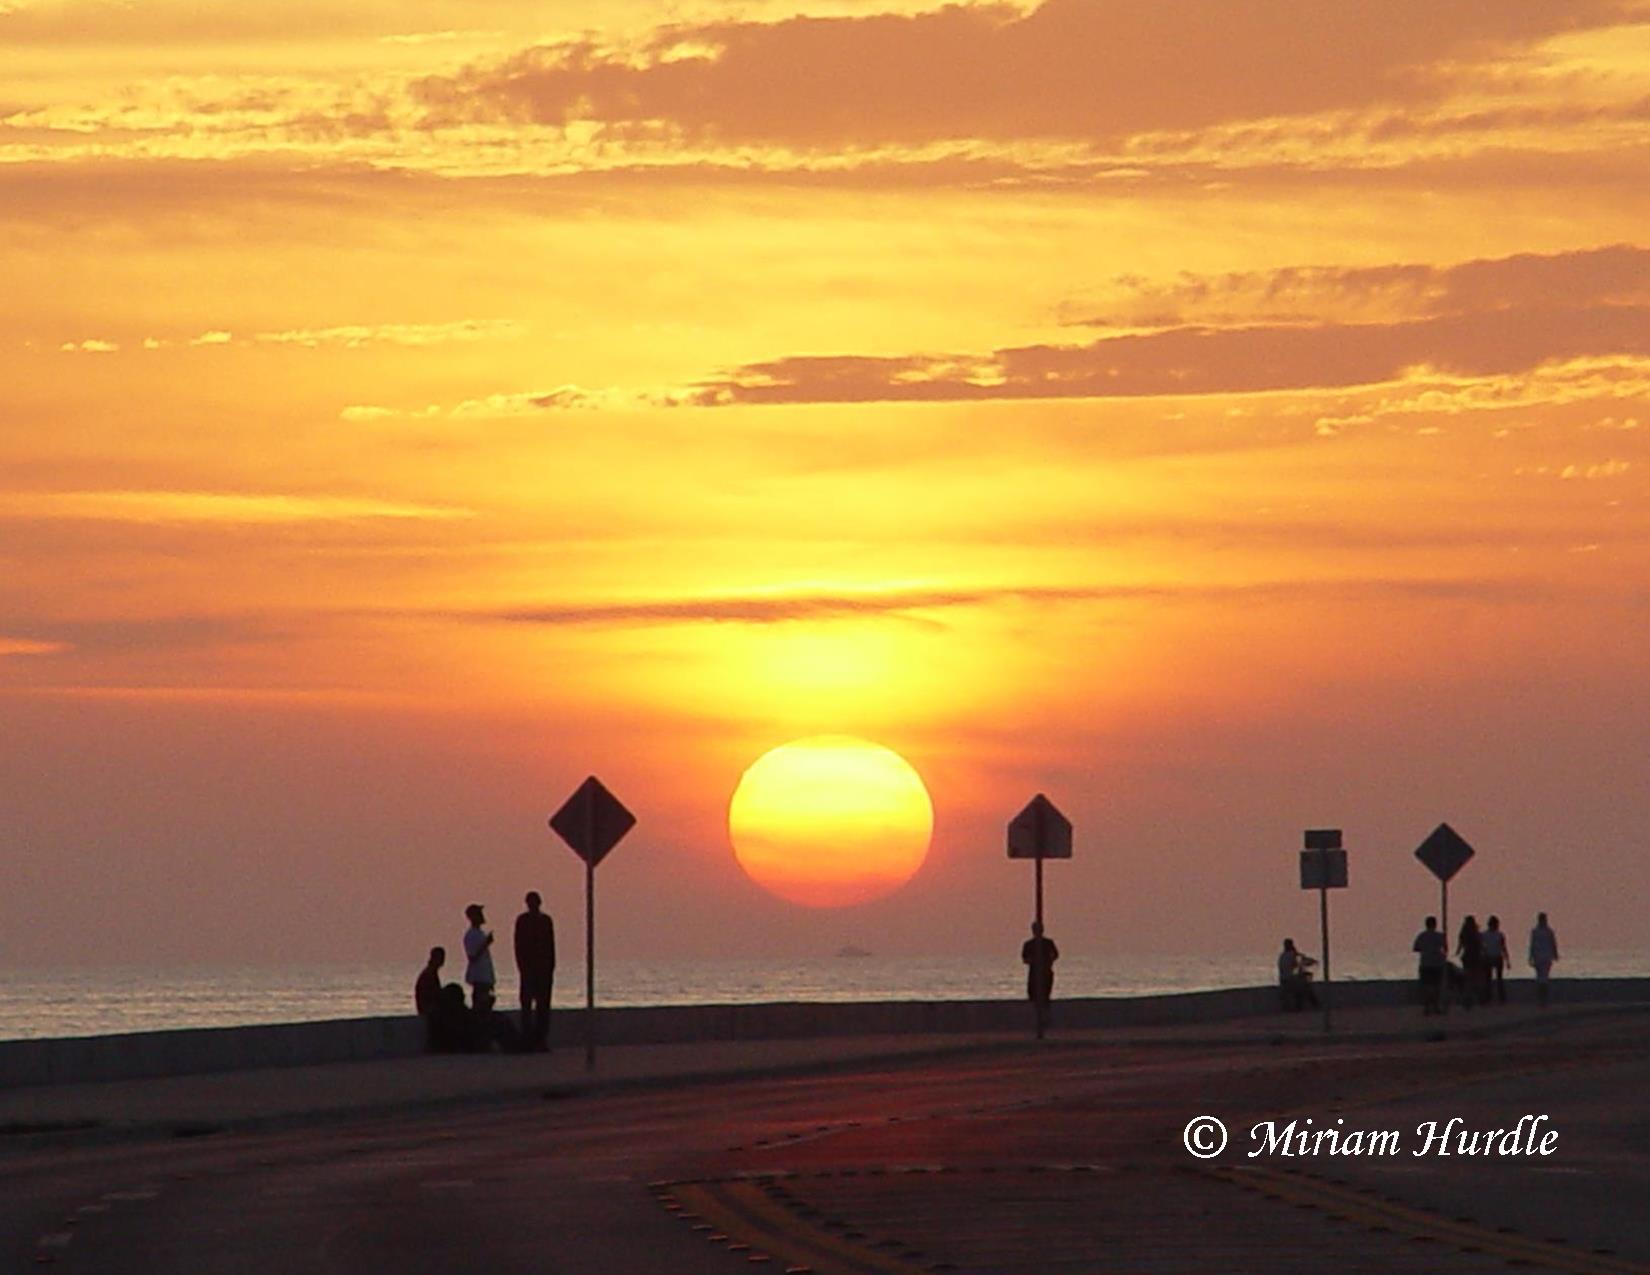 KW281.Sunset1